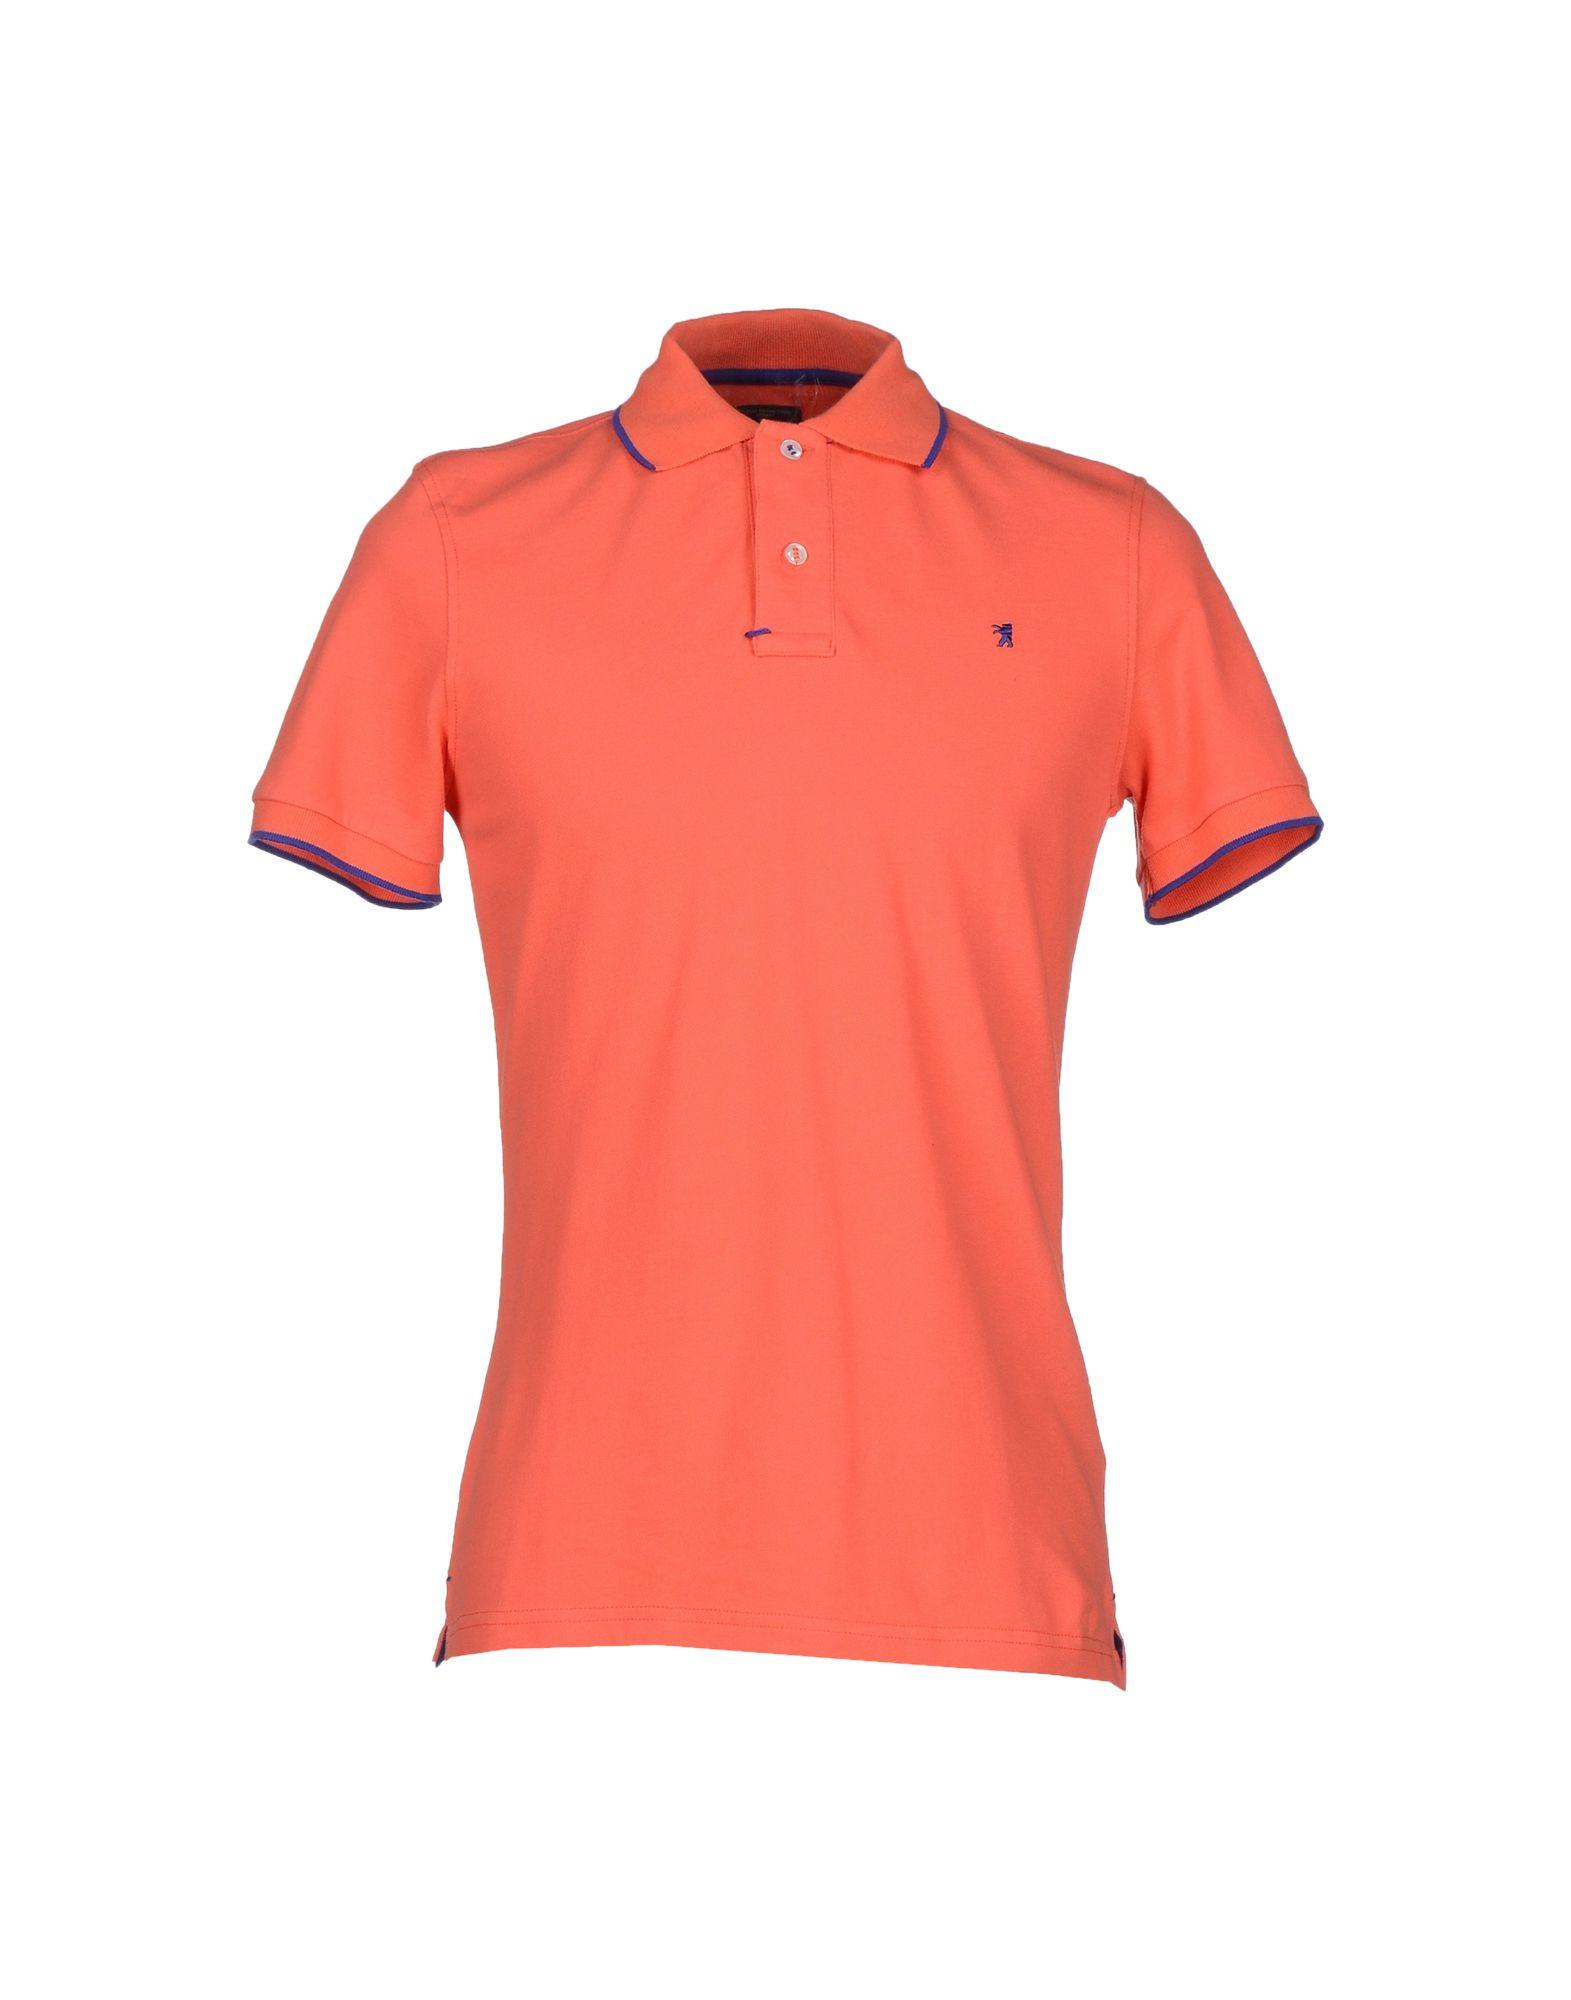 Lyst jaggy polo shirt in orange for men for Orange polo shirt mens